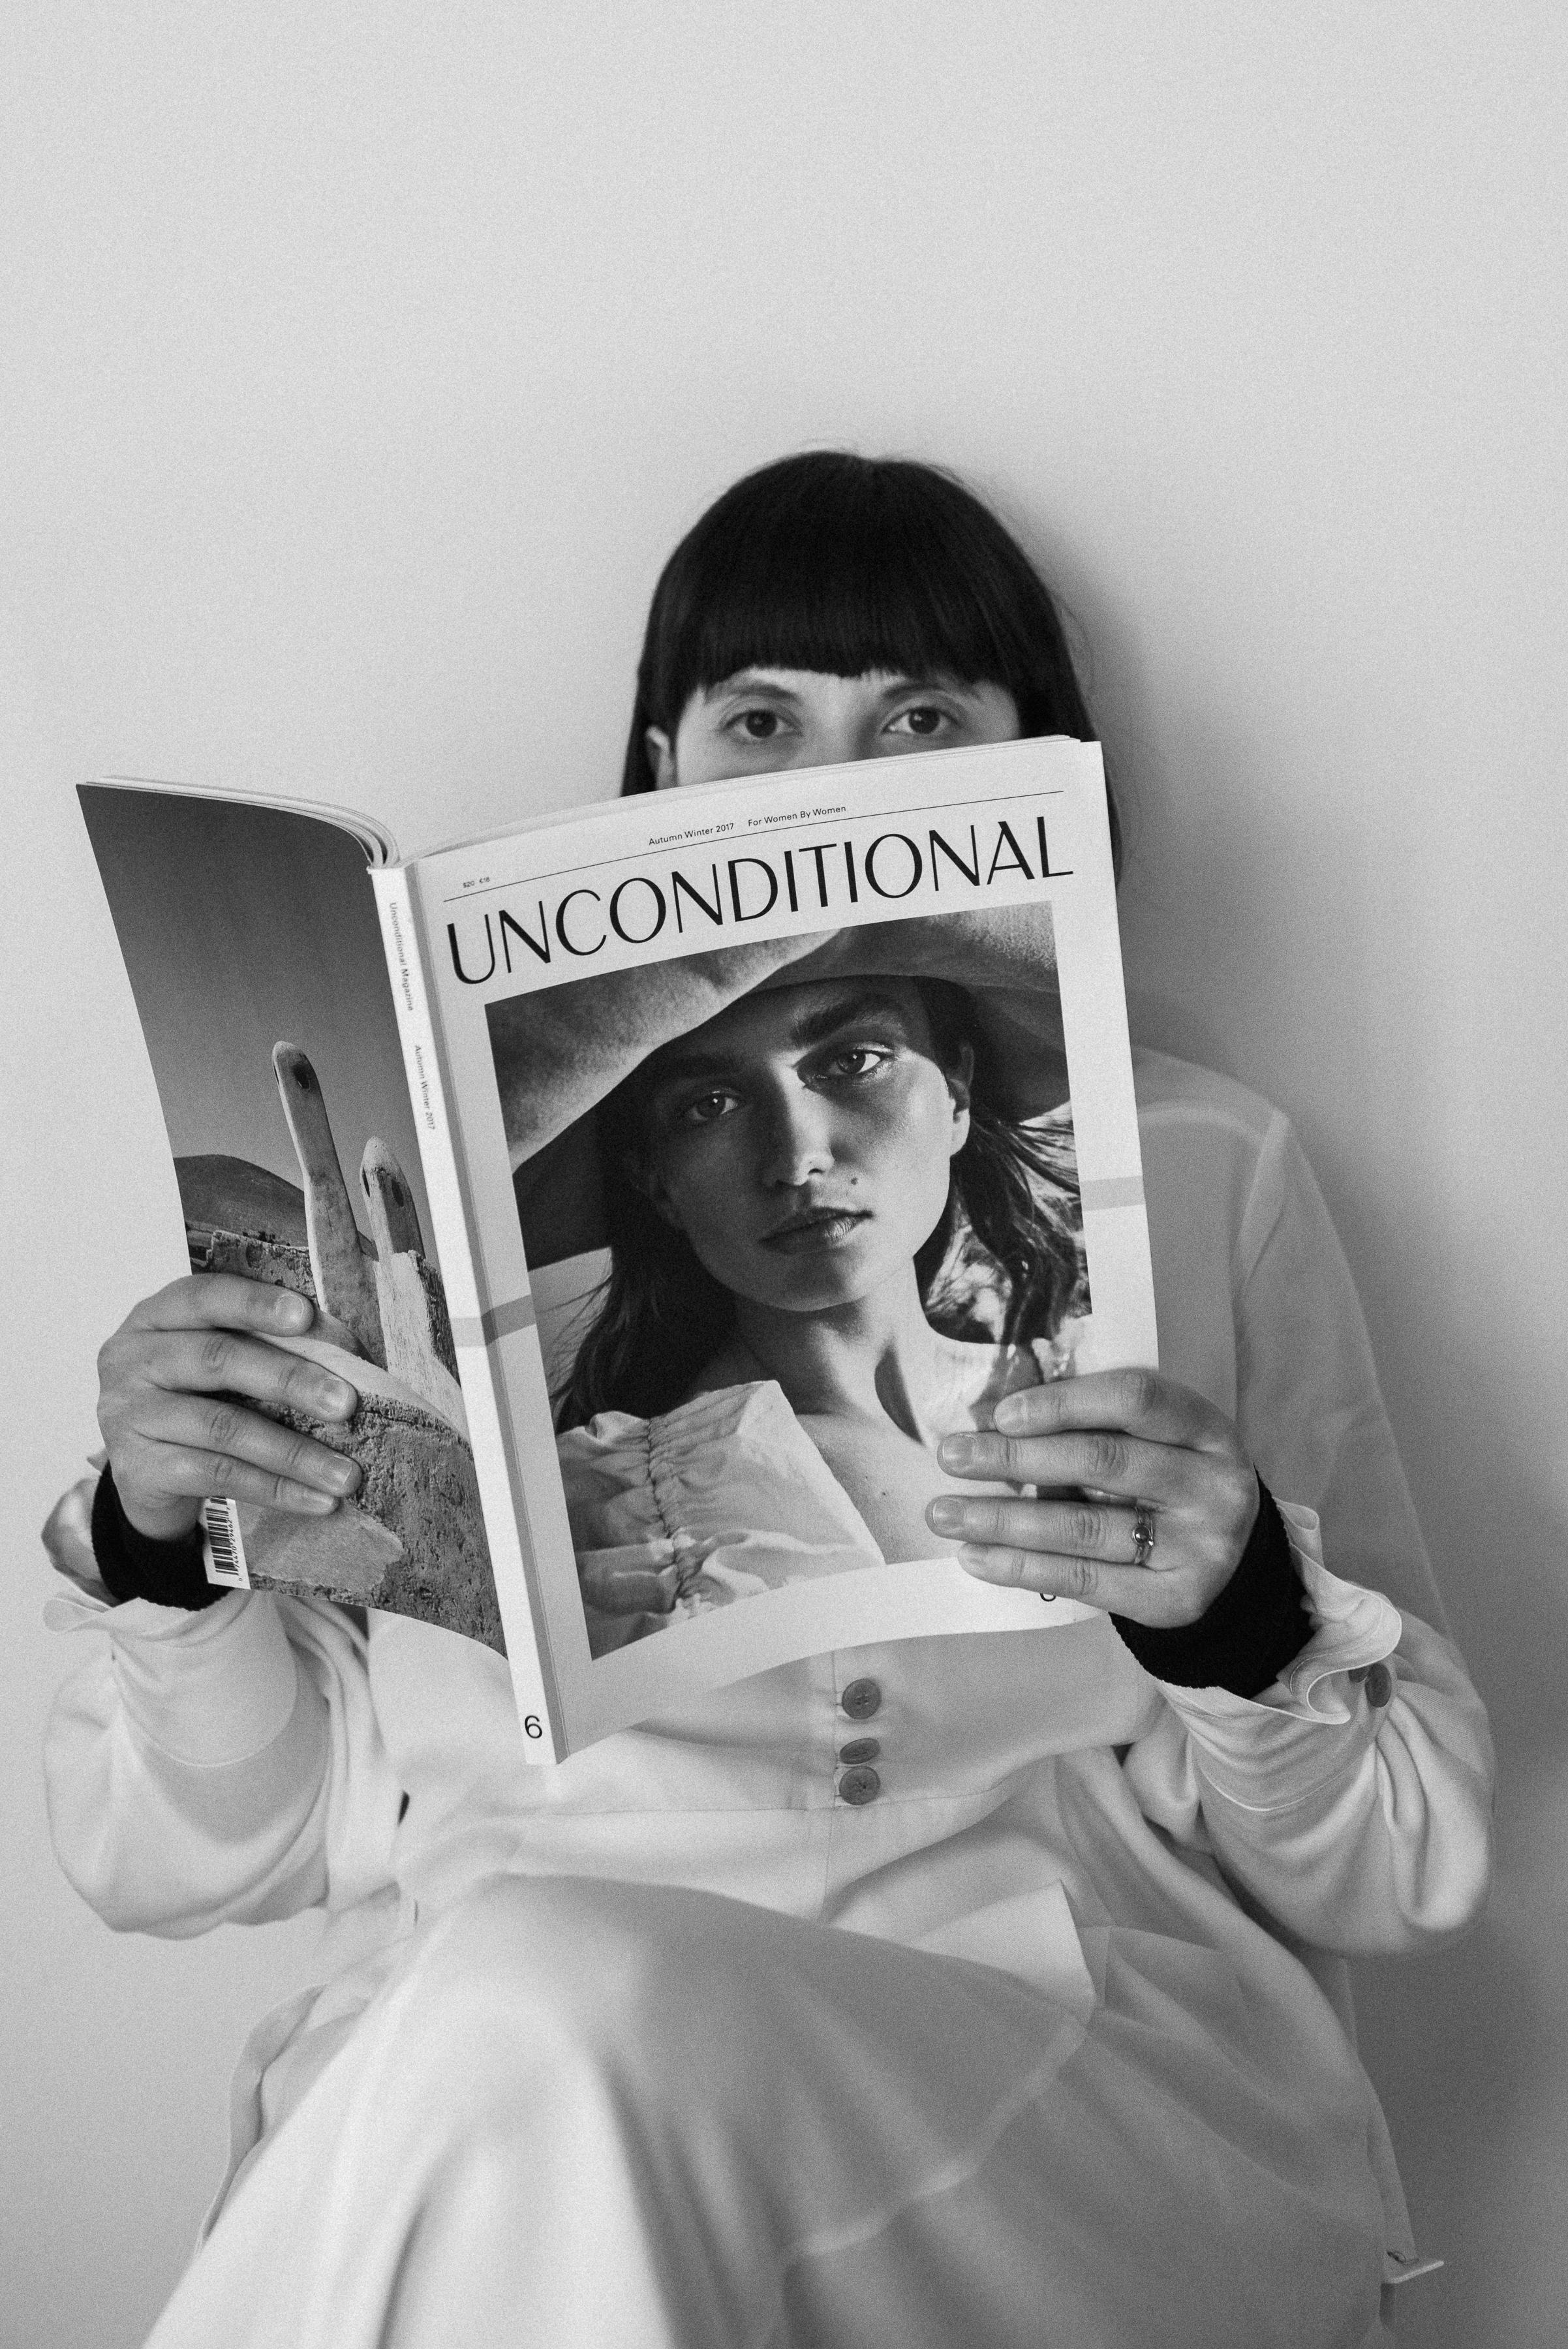 UNCONDITIONAL 001.jpg